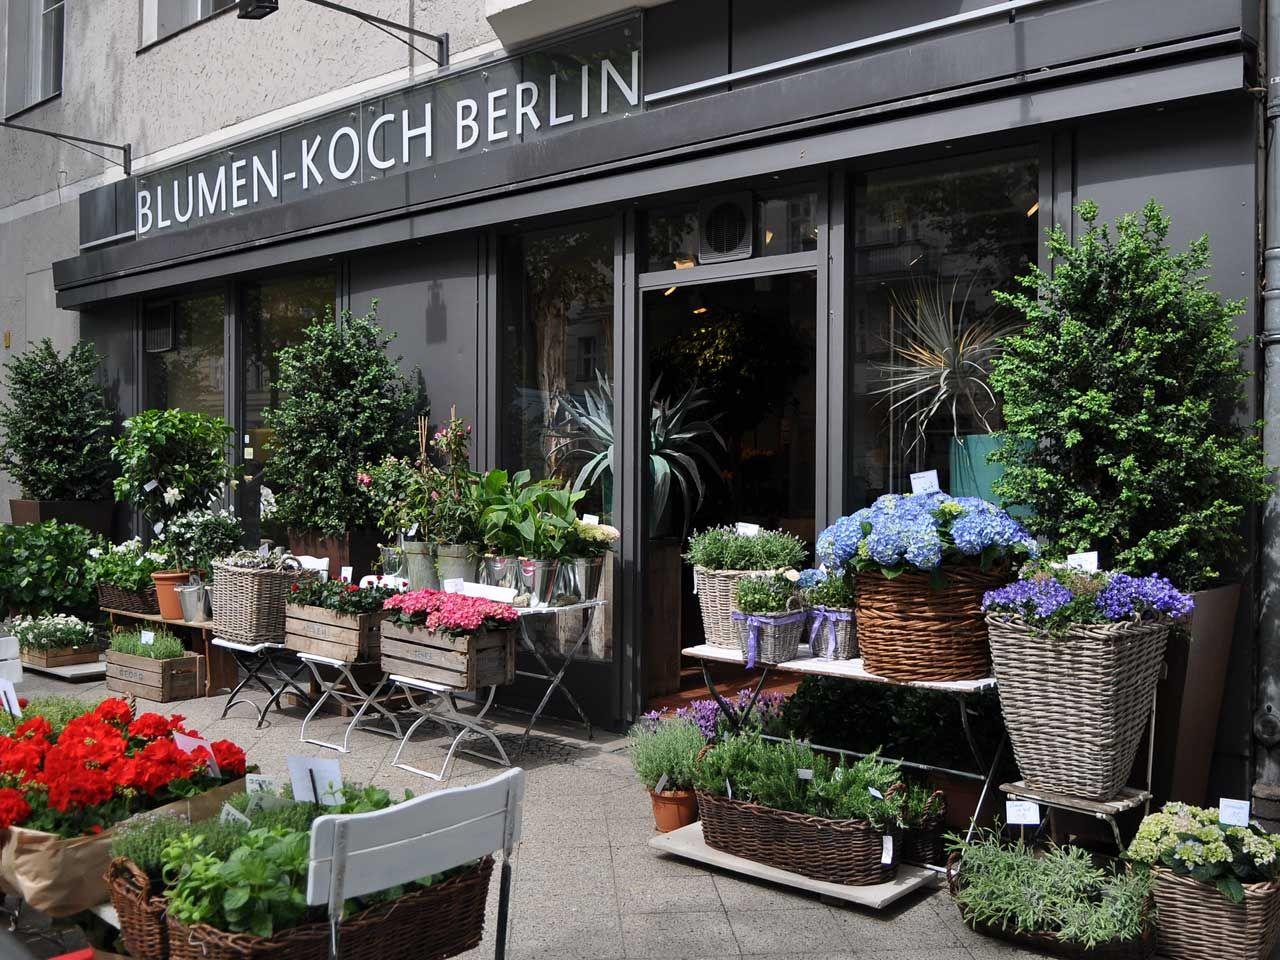 Blumen Koch Berlin Blumengeschafte Blumenladen Berlin Blumen Berlin